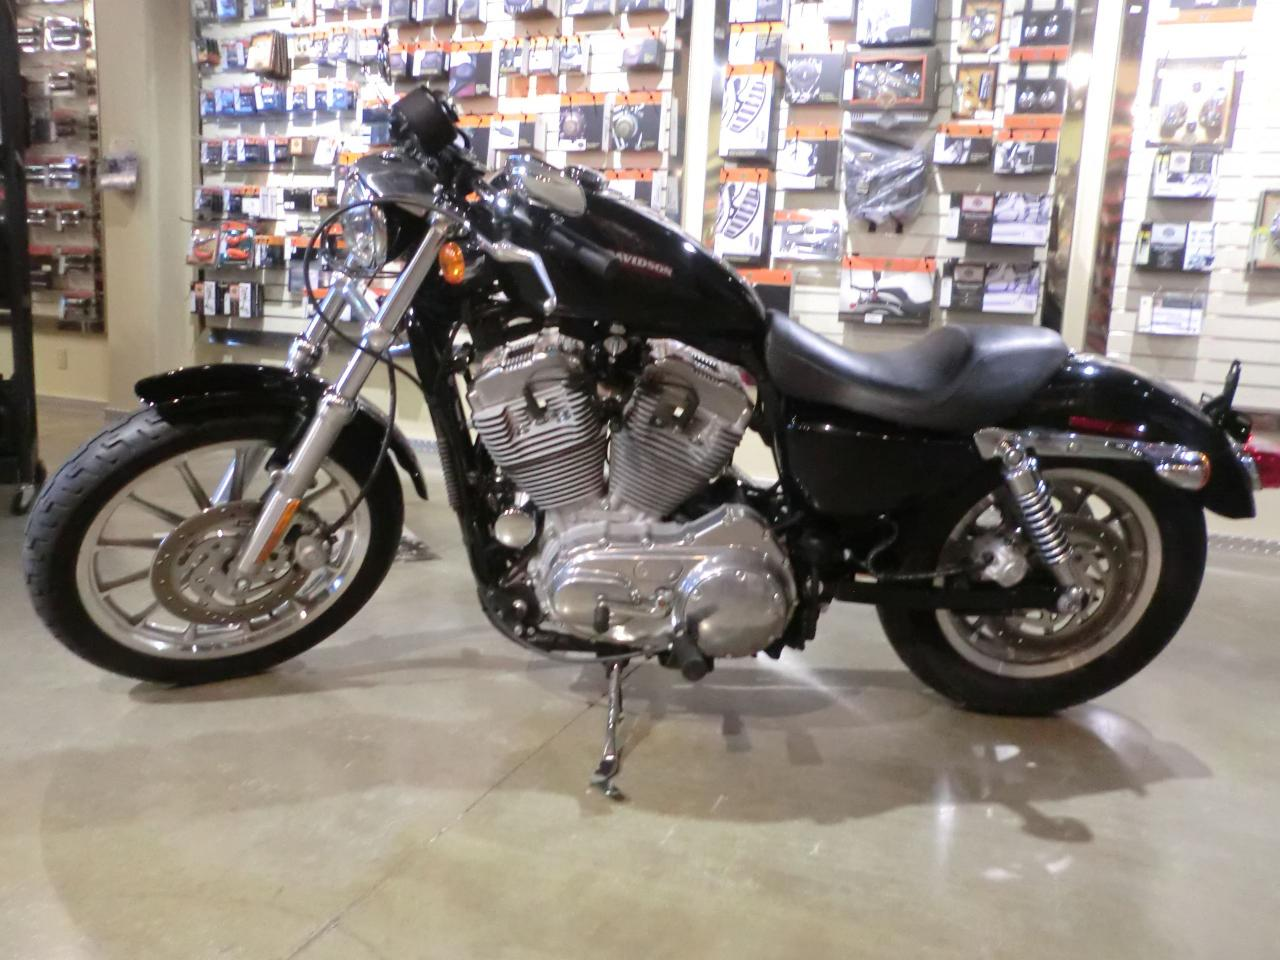 2006 Harley-Davidson XL883 SPORTSTER 883